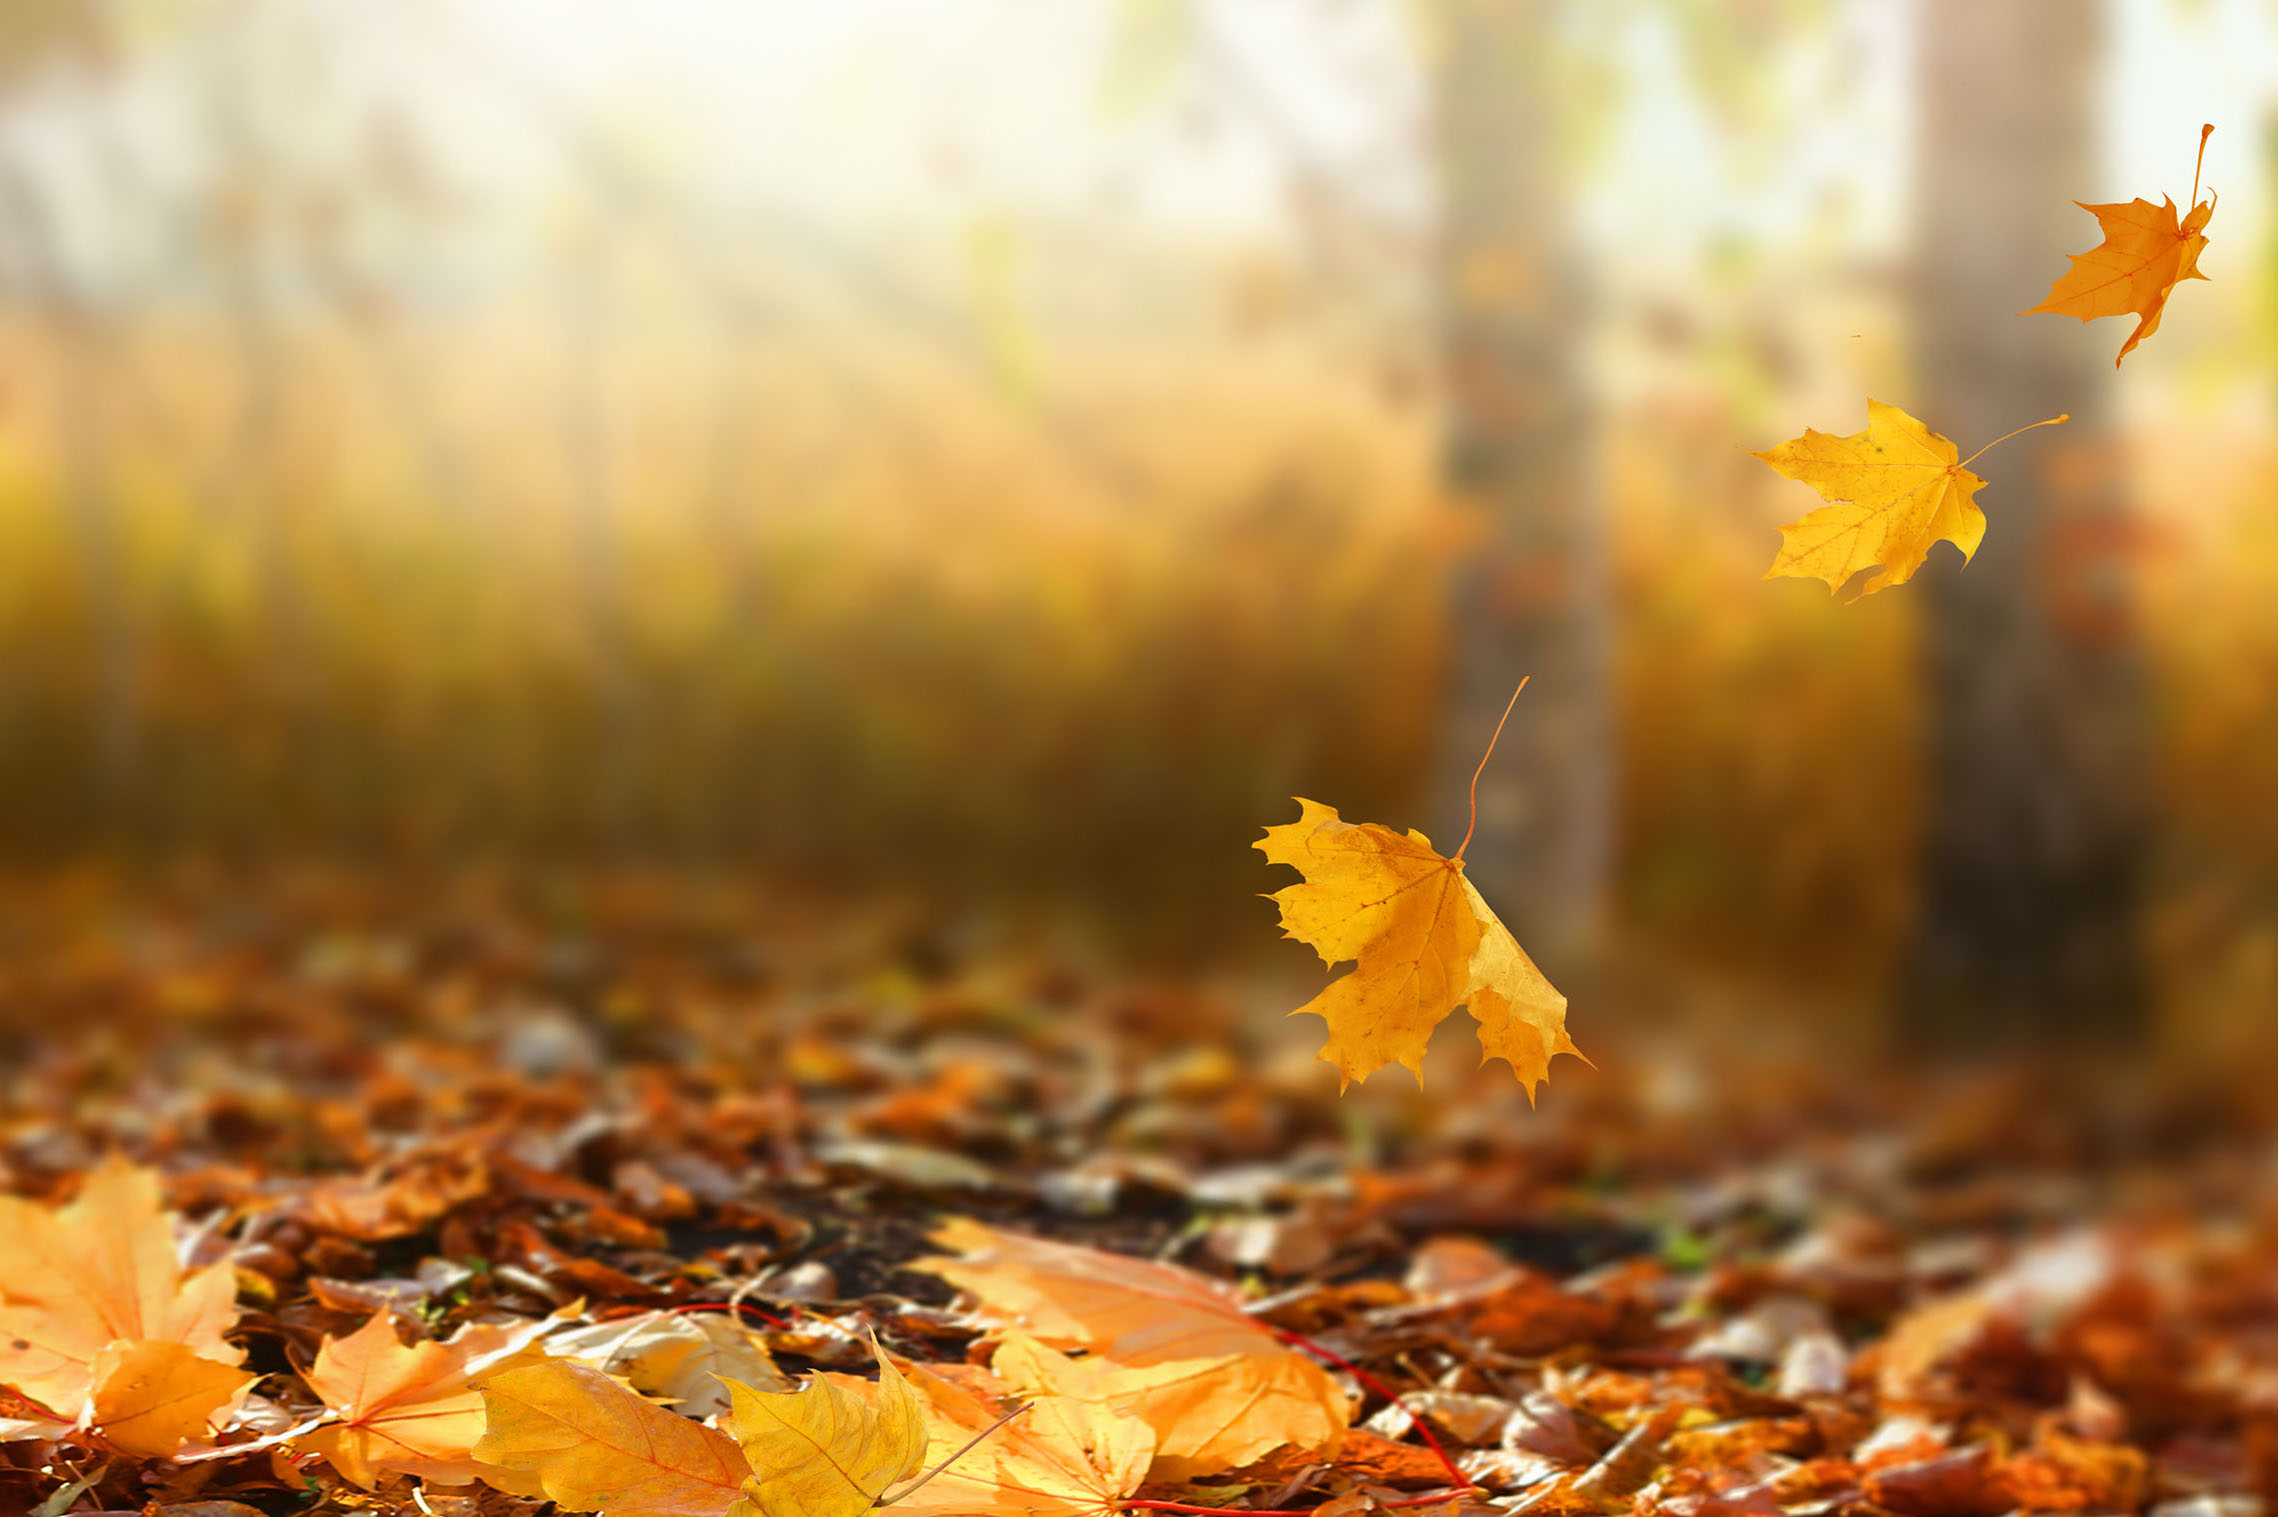 Autumn Collection #4